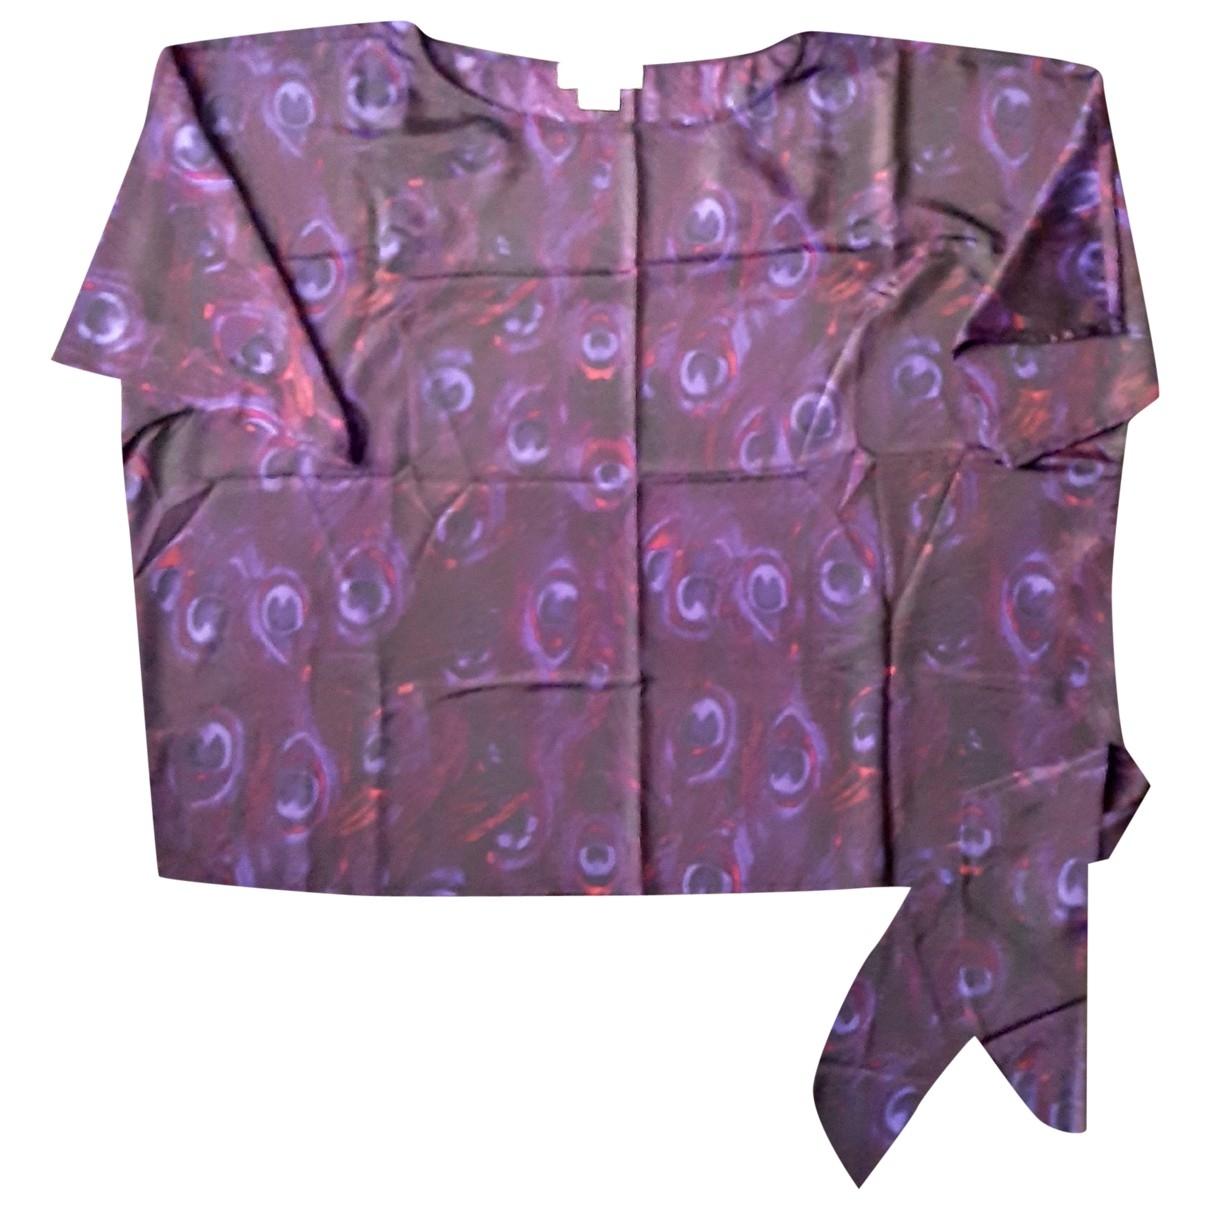 Michael Kors \N Purple  top for Women XXXL International